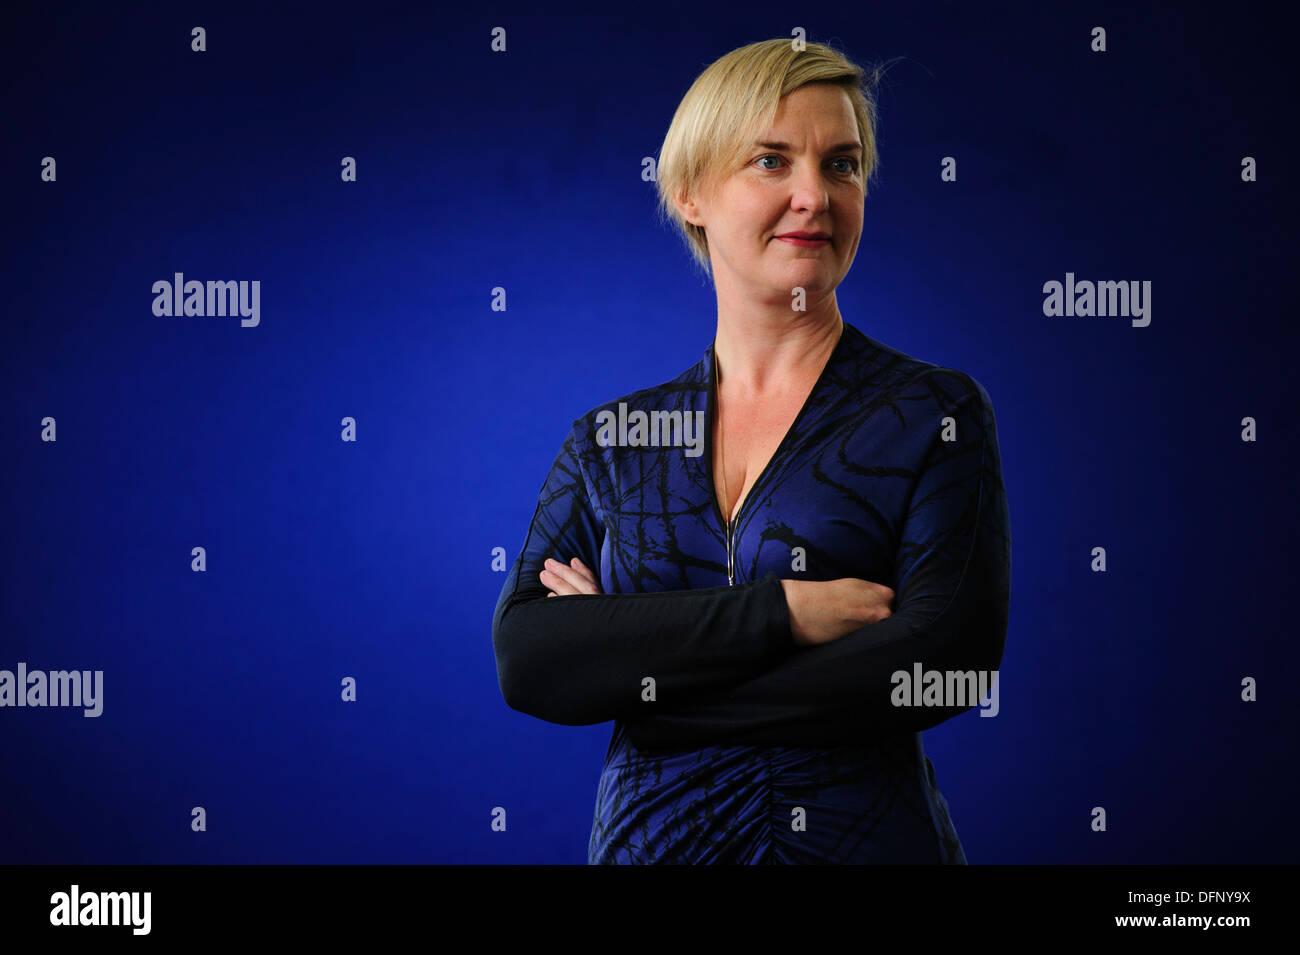 Charlotte Higgins, The Guardian chief arts reporter, attending at the Edinburgh International Book Festival 2013. - Stock Image